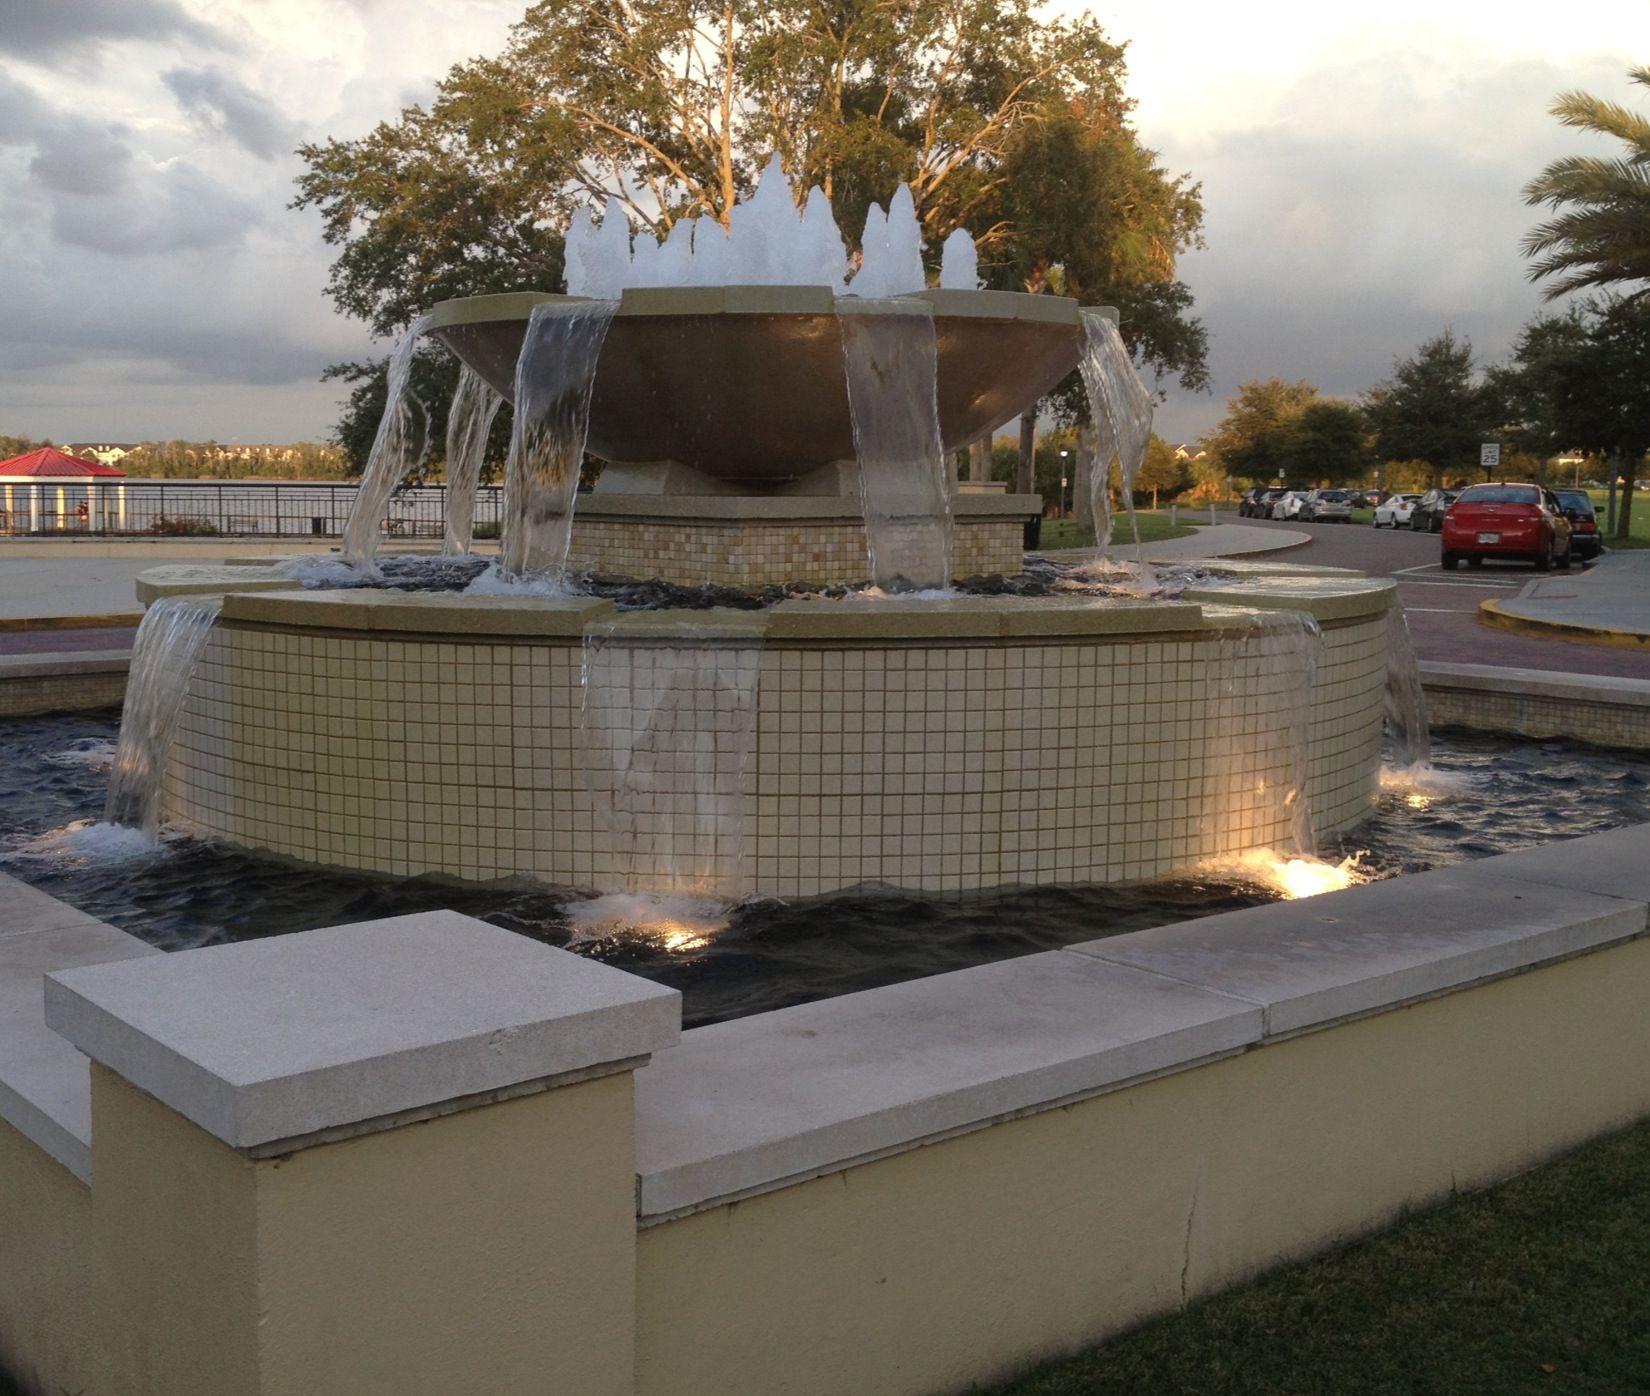 Baldwin Park Orlando: Baldwin Park, Orlando, FL